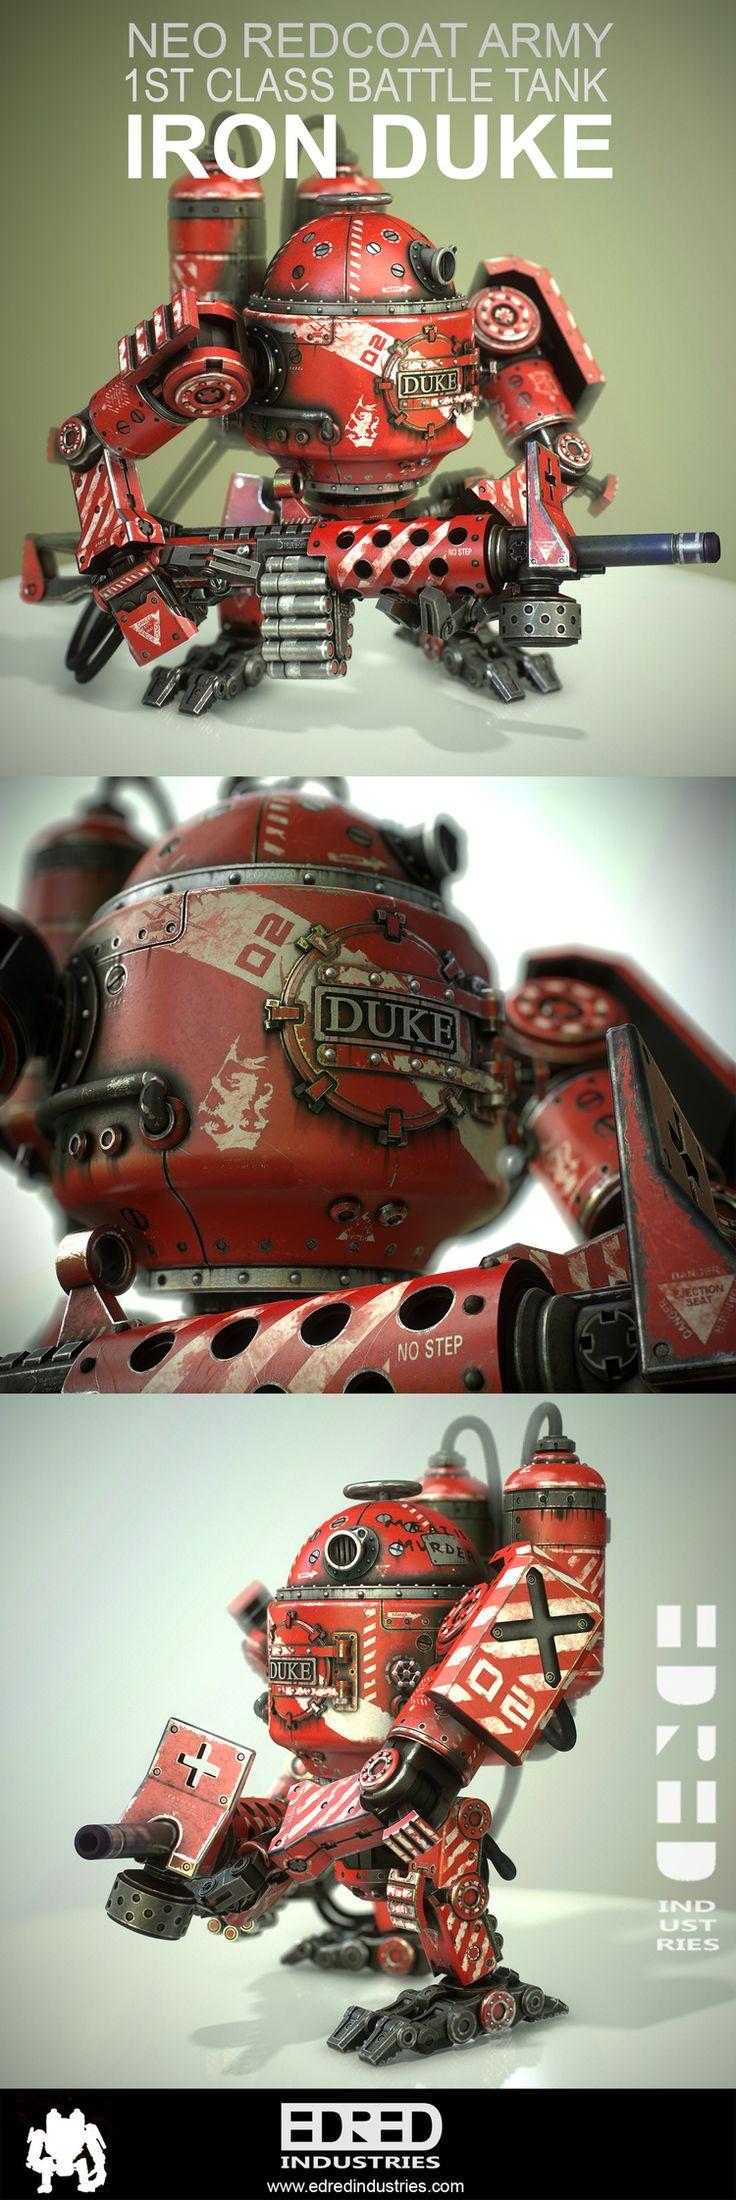 Edred Industries: IRON DUKE Steampunk Robot                                                                                                                                                                                 More